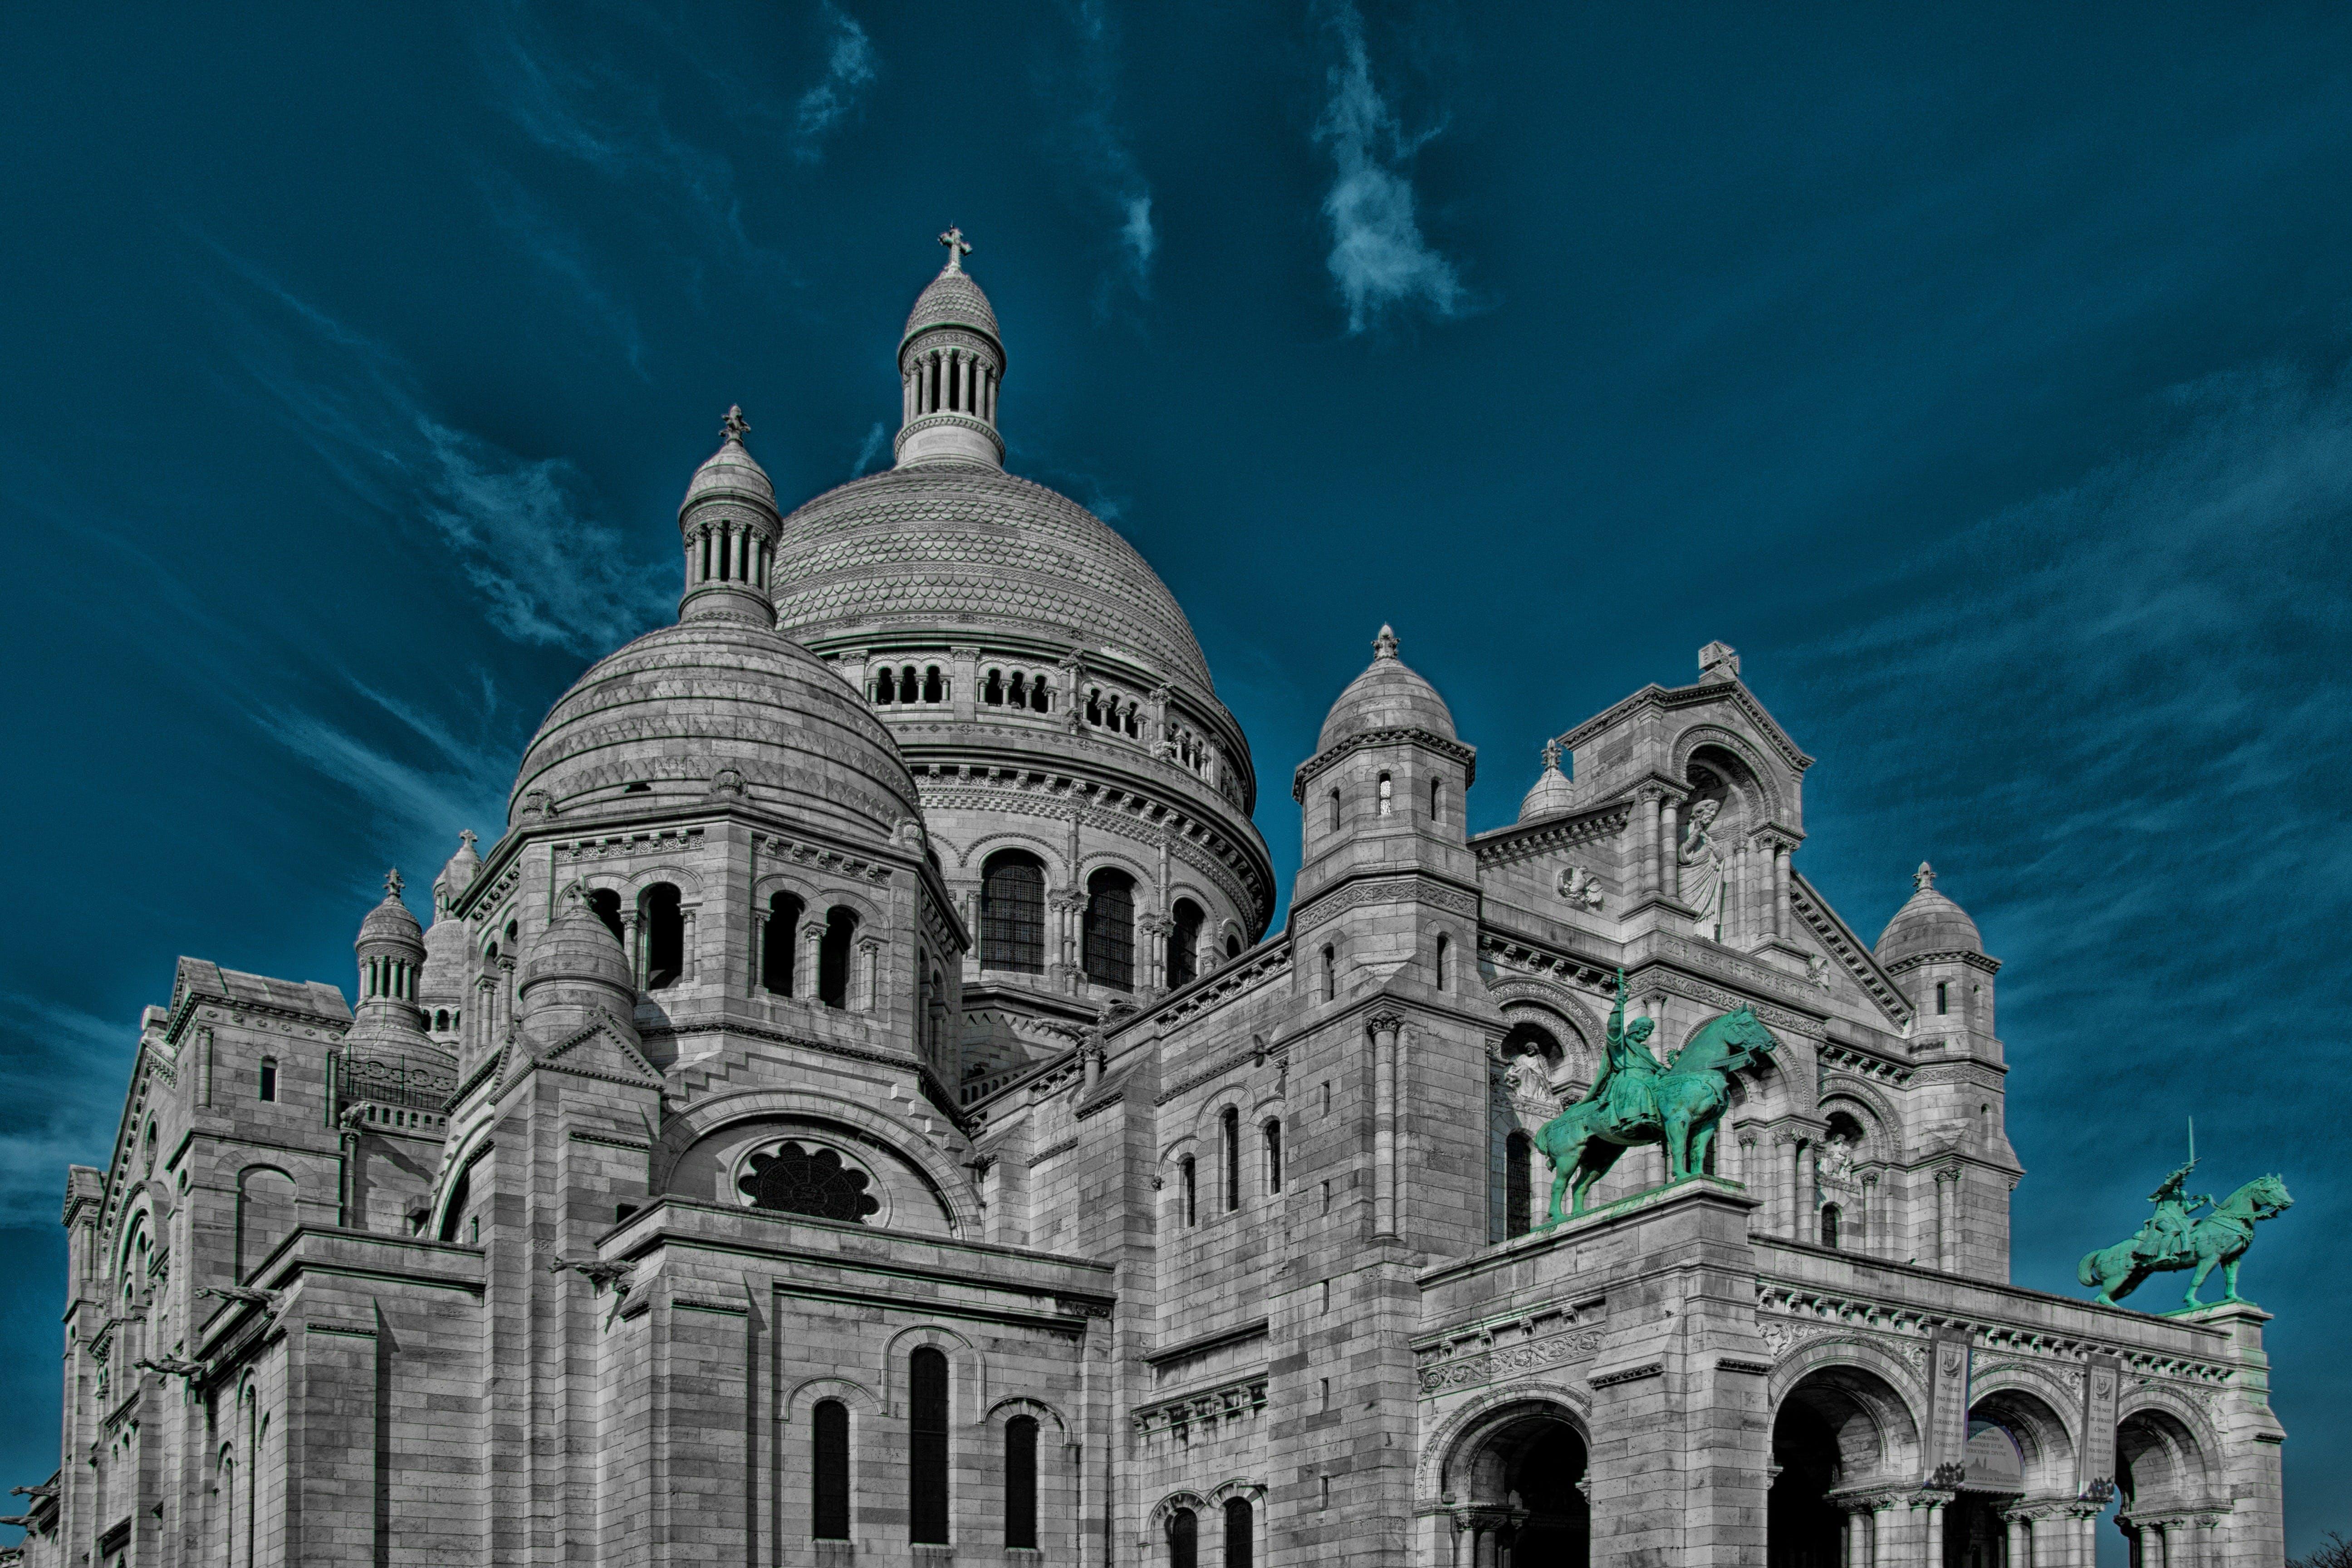 Basilica of the Sacred Heart of Paris, church, france